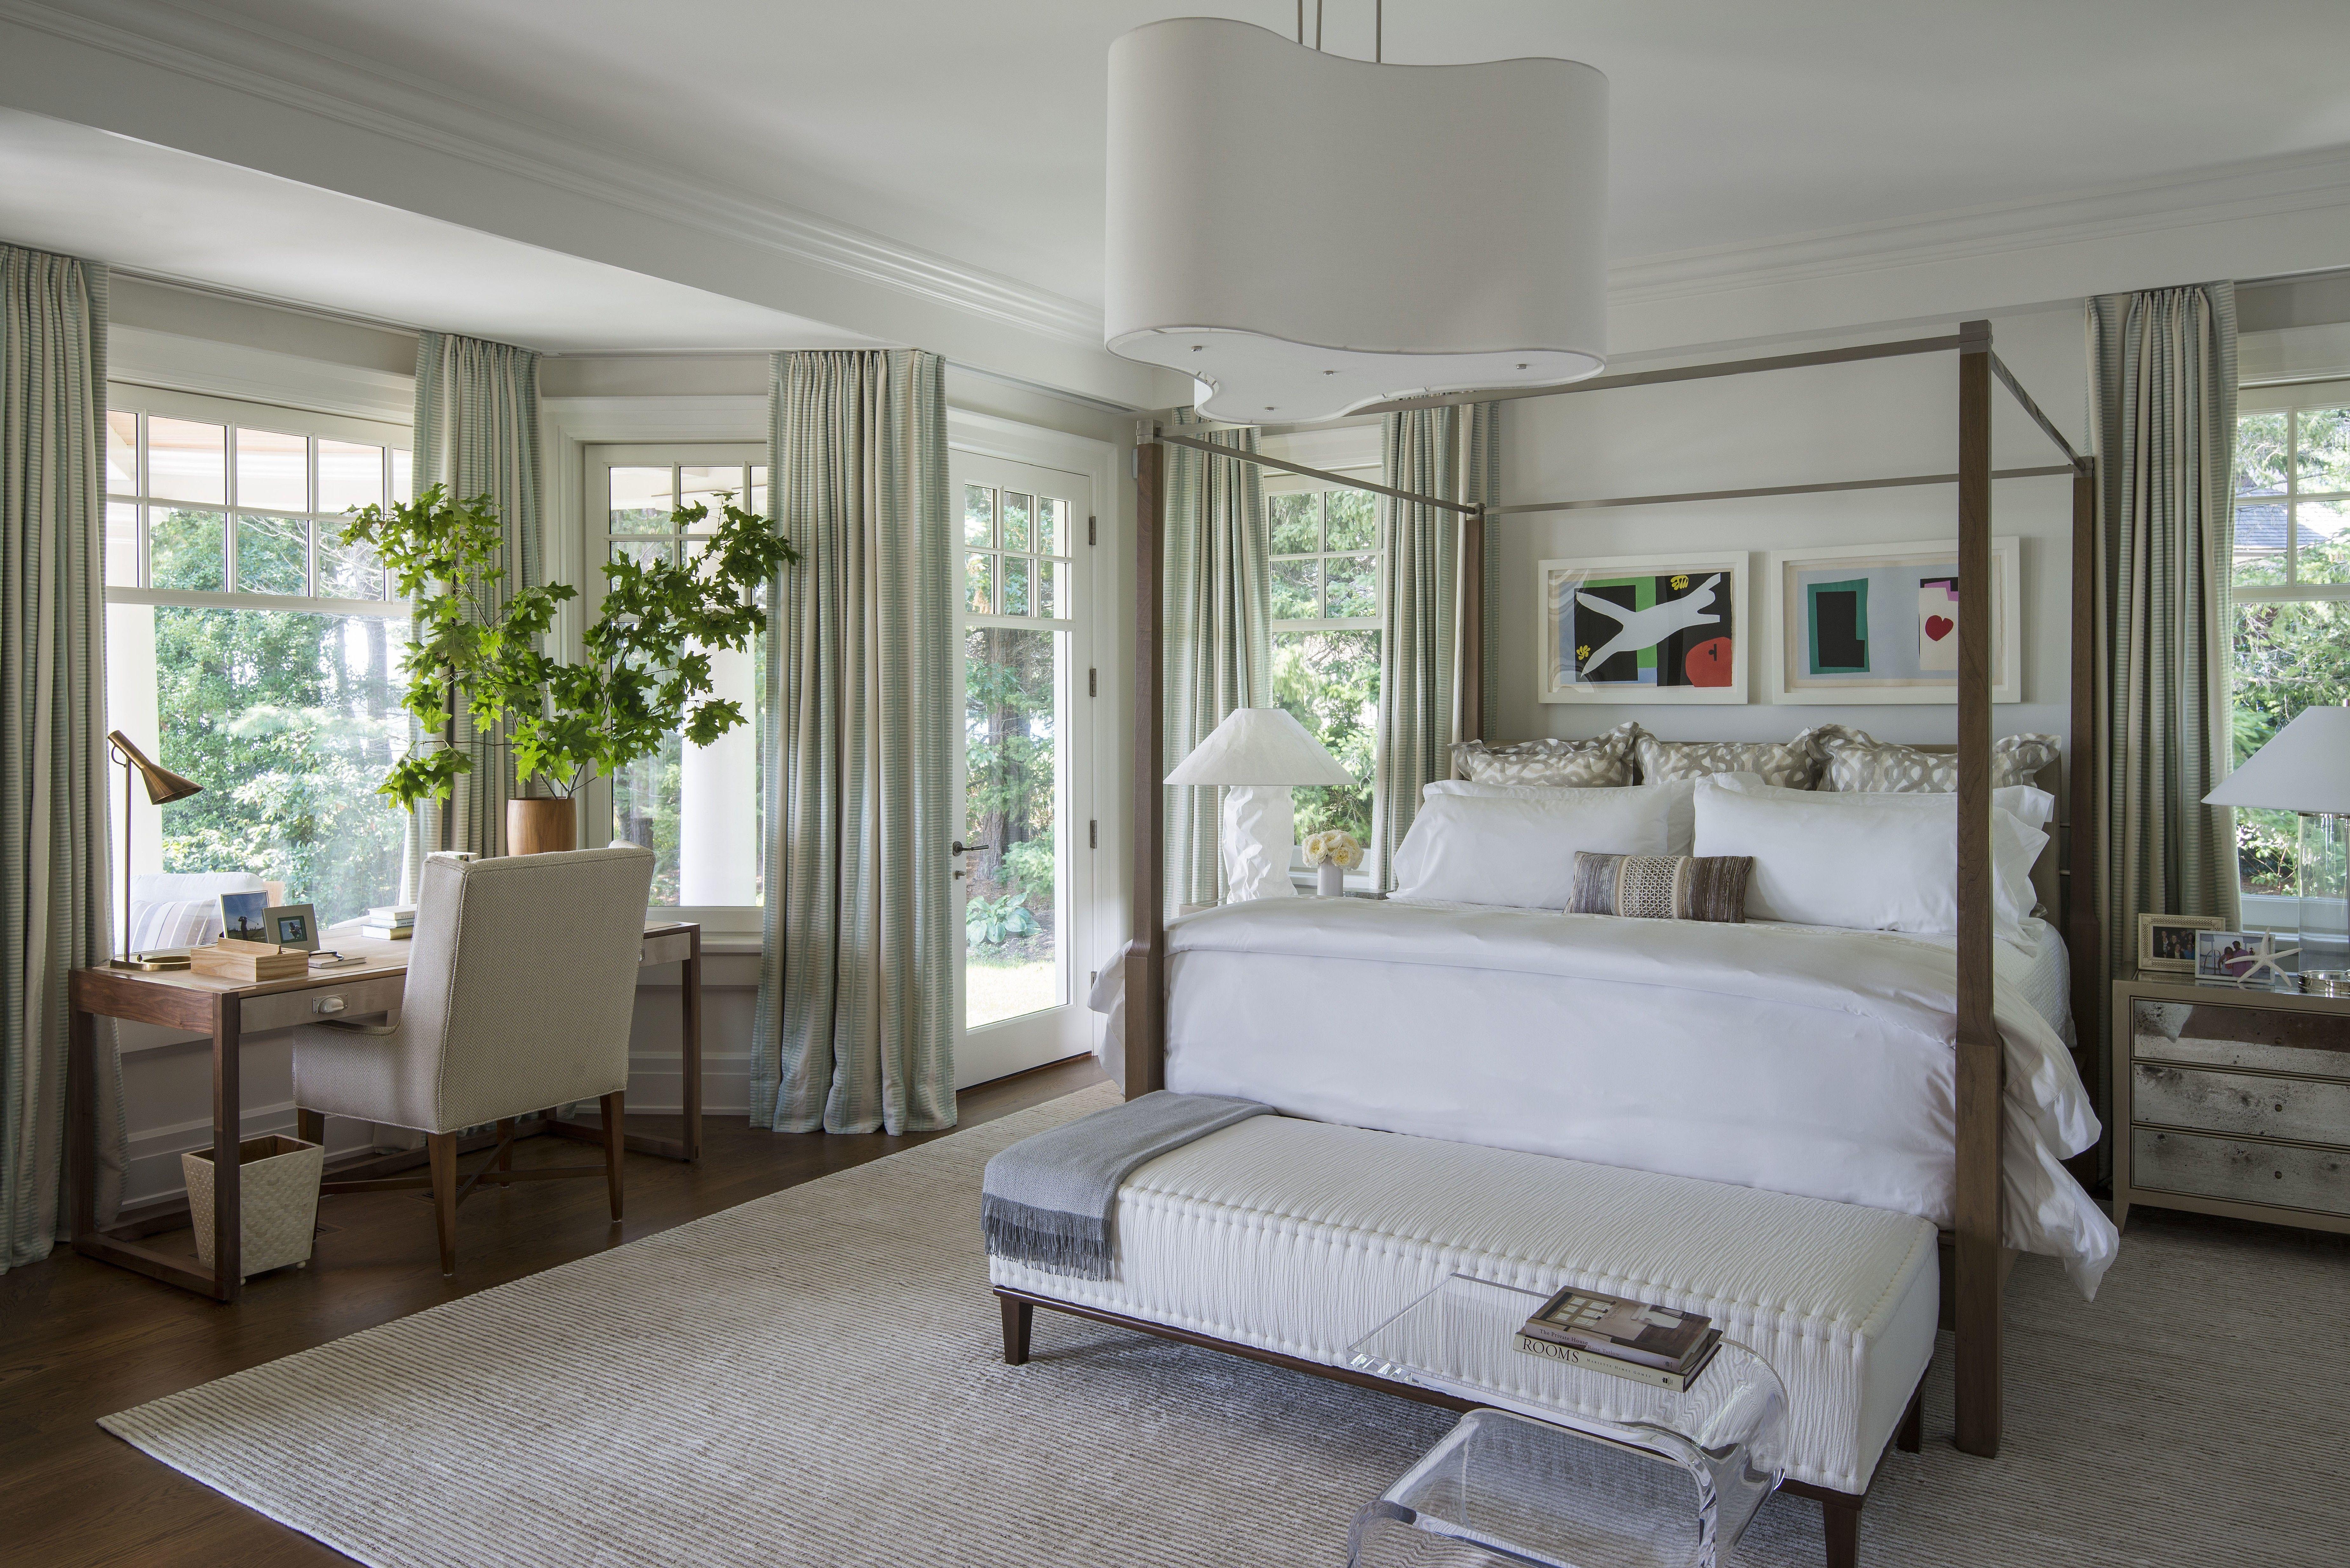 Bedroom Interiors Ideas 99 Gallery For Website Amazing New